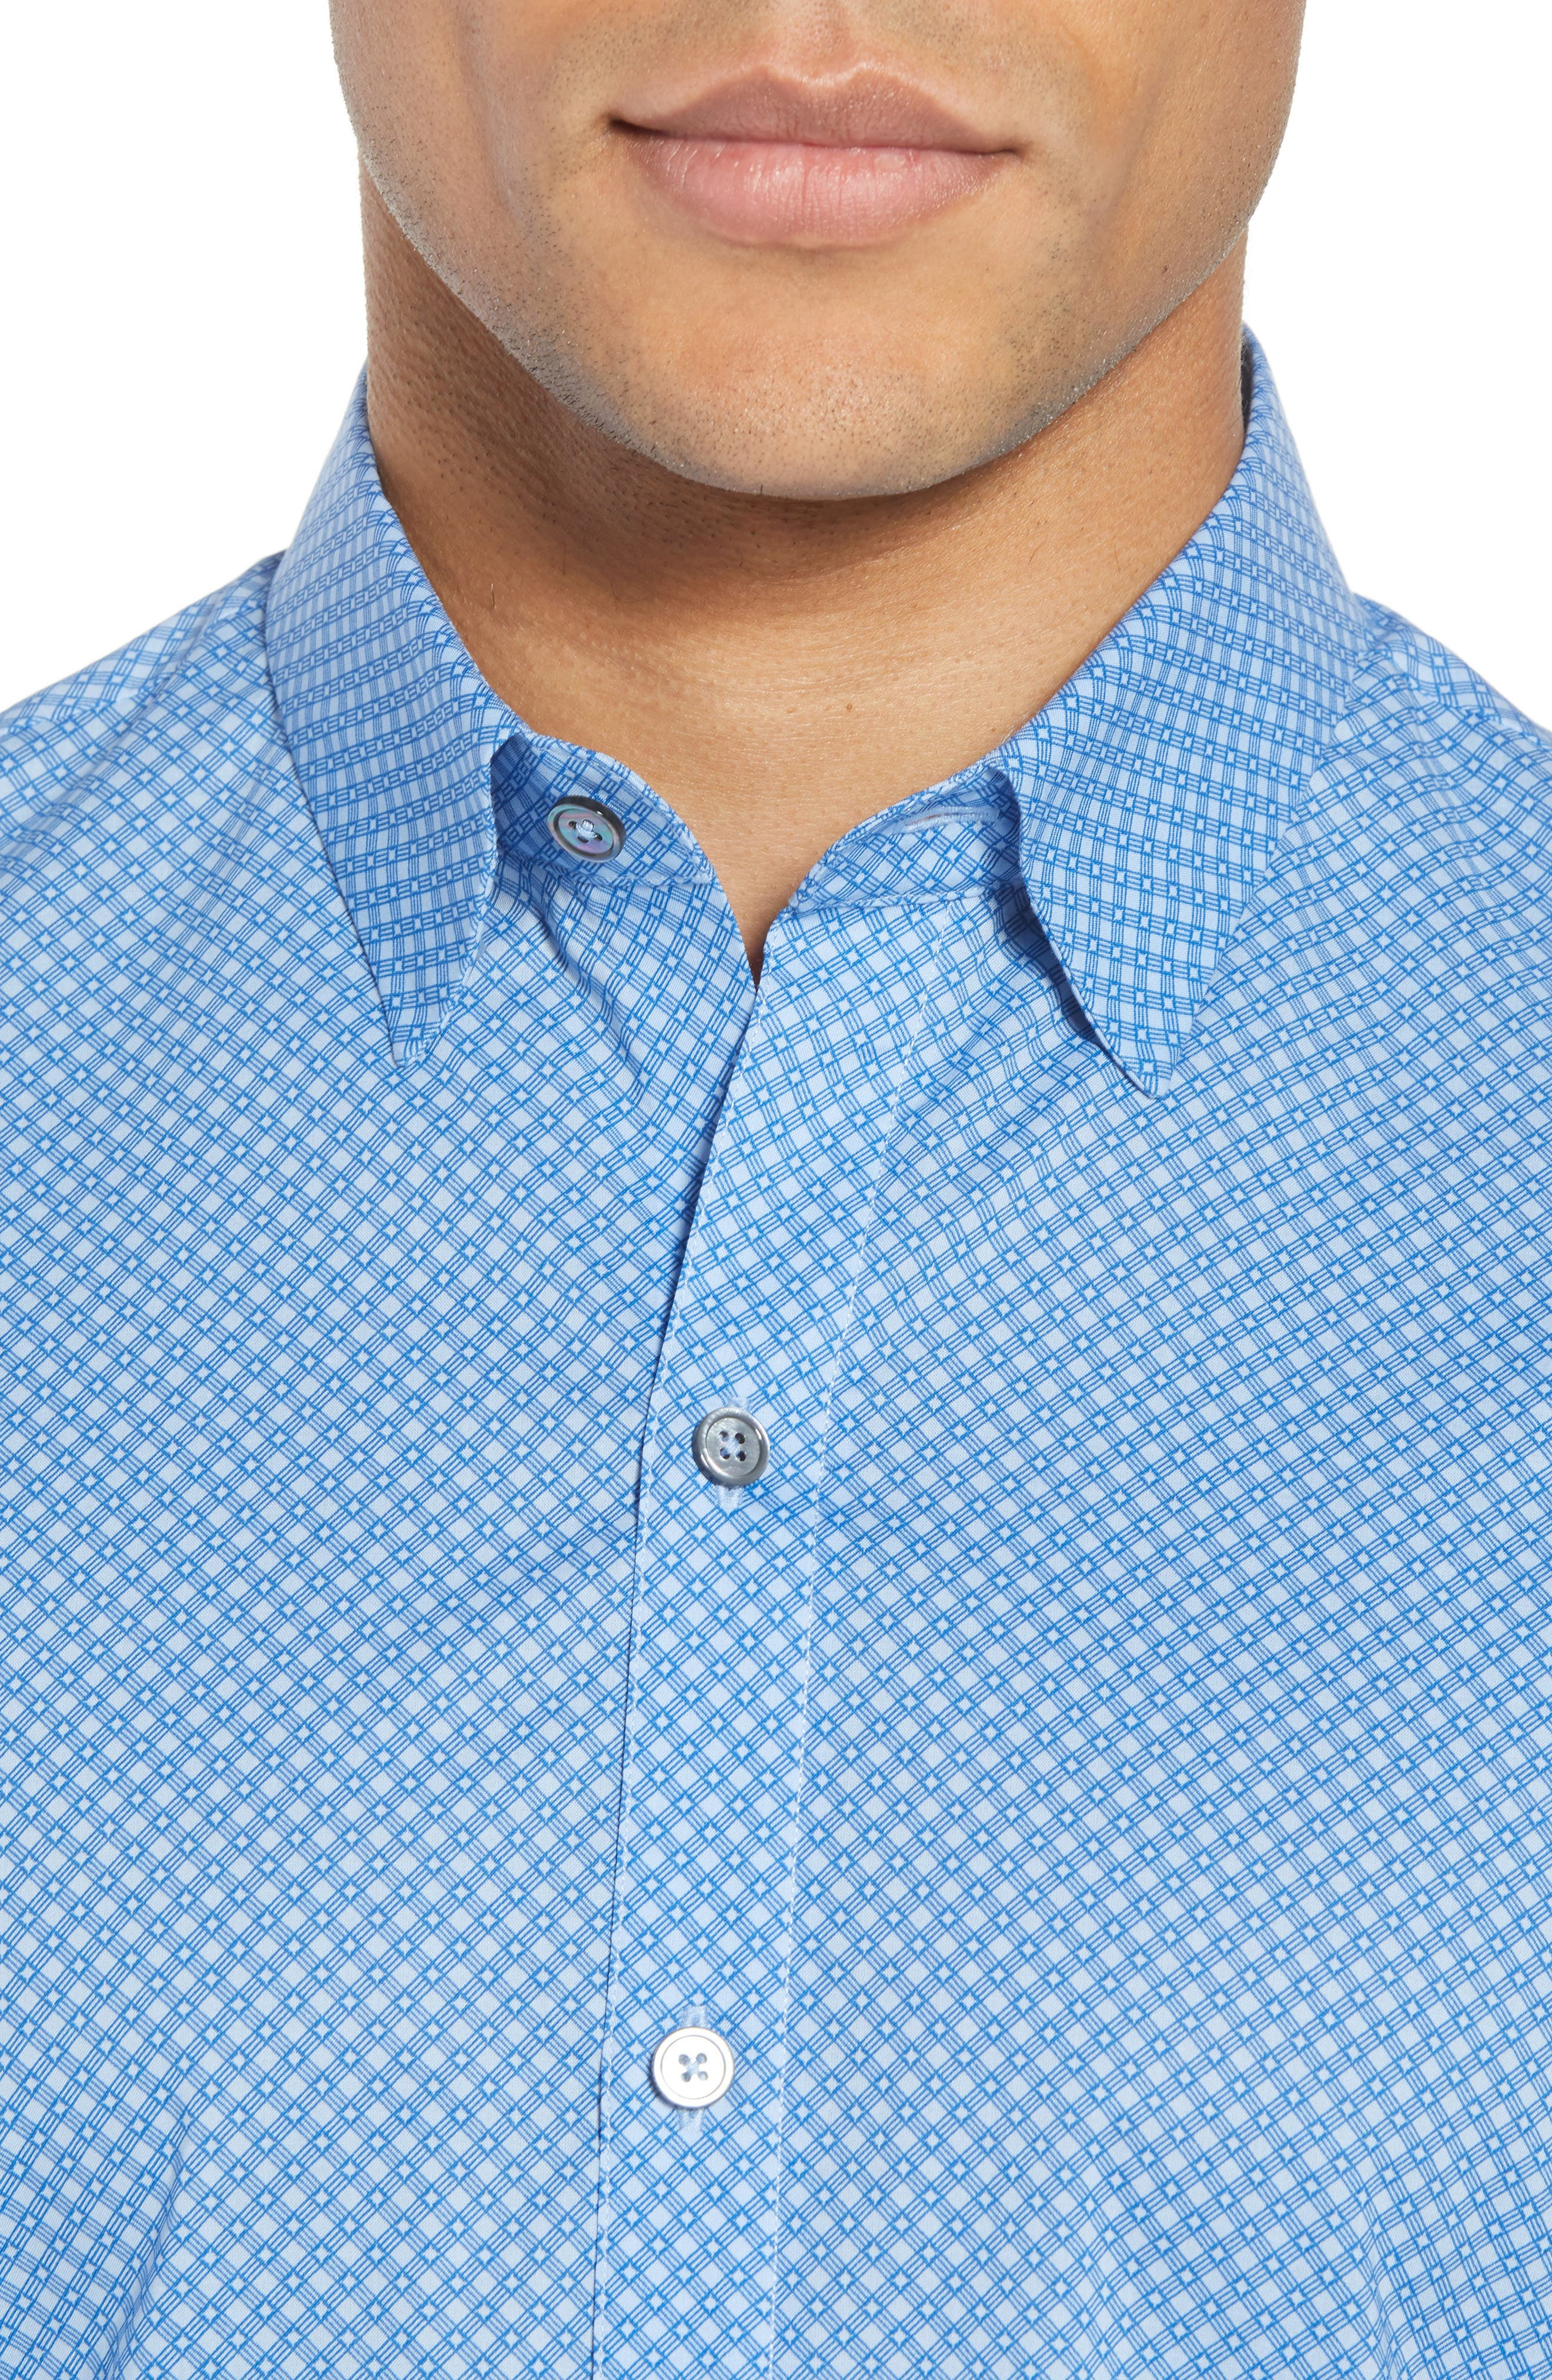 Ethan Slim Fit Sport Shirt,                             Alternate thumbnail 4, color,                             Blue